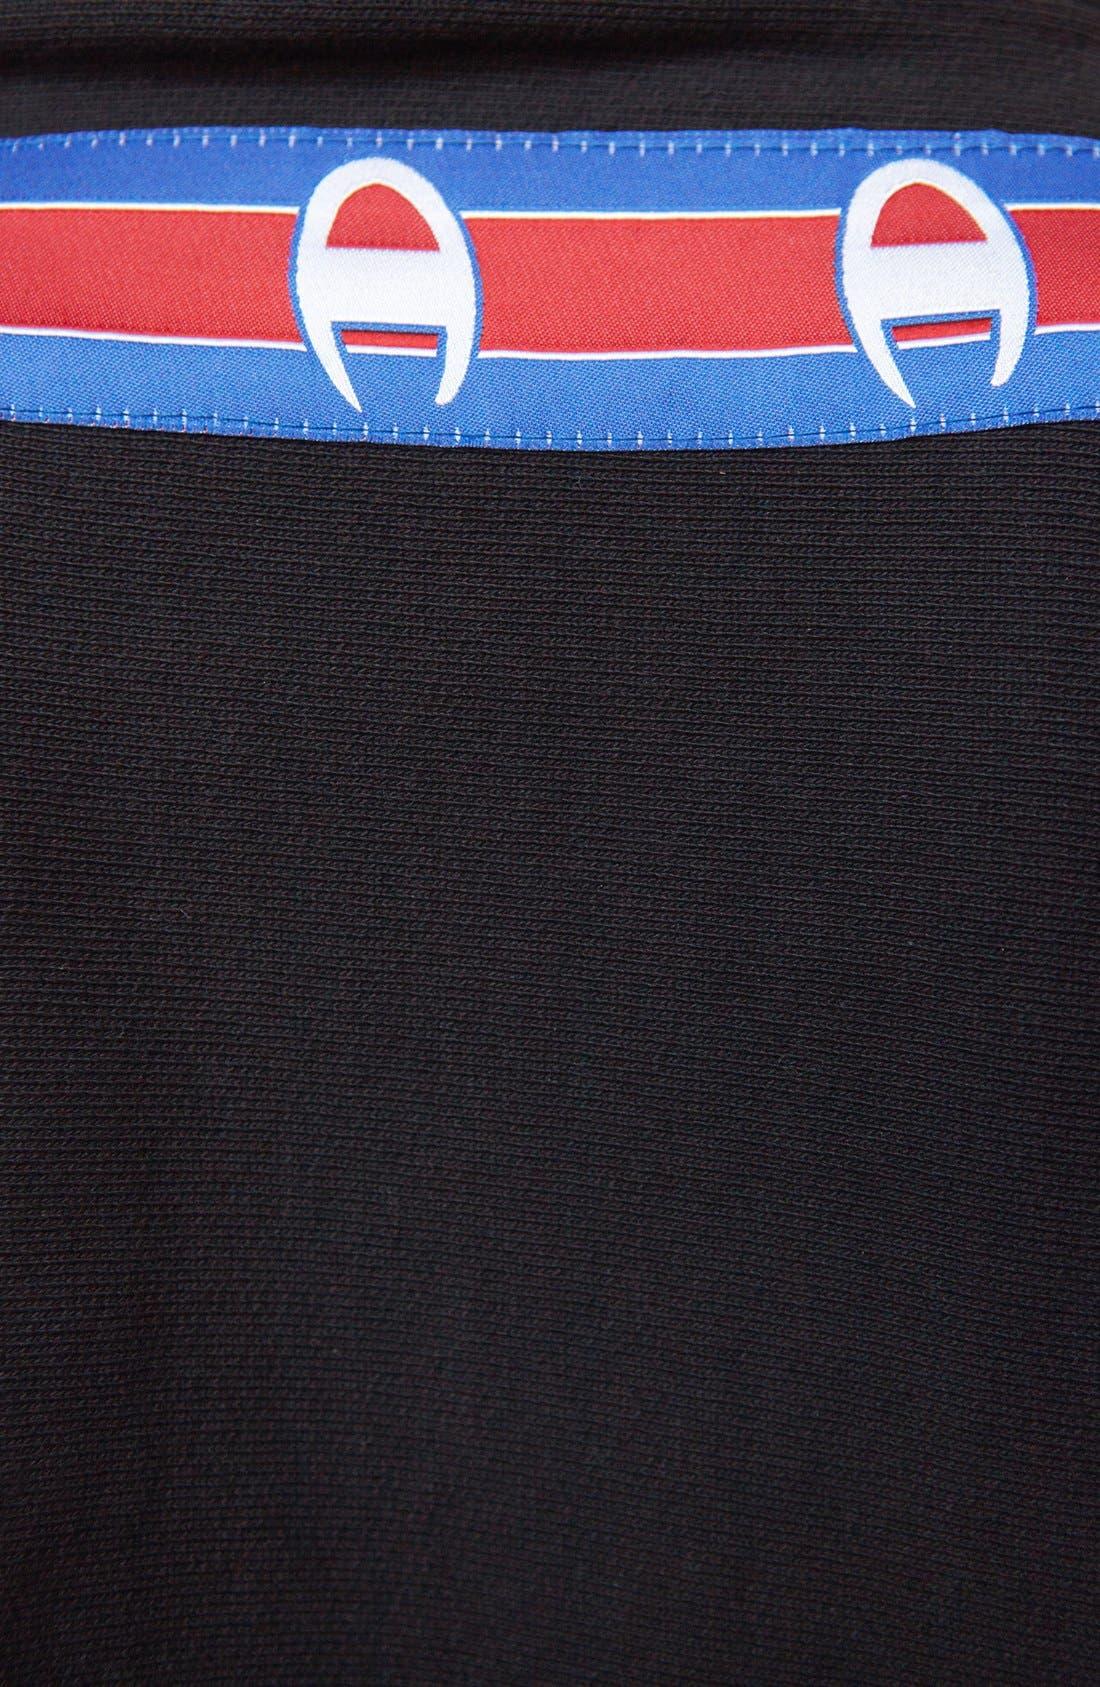 Alternate Image 3  - Vetements x Champion Taped Sweatpants